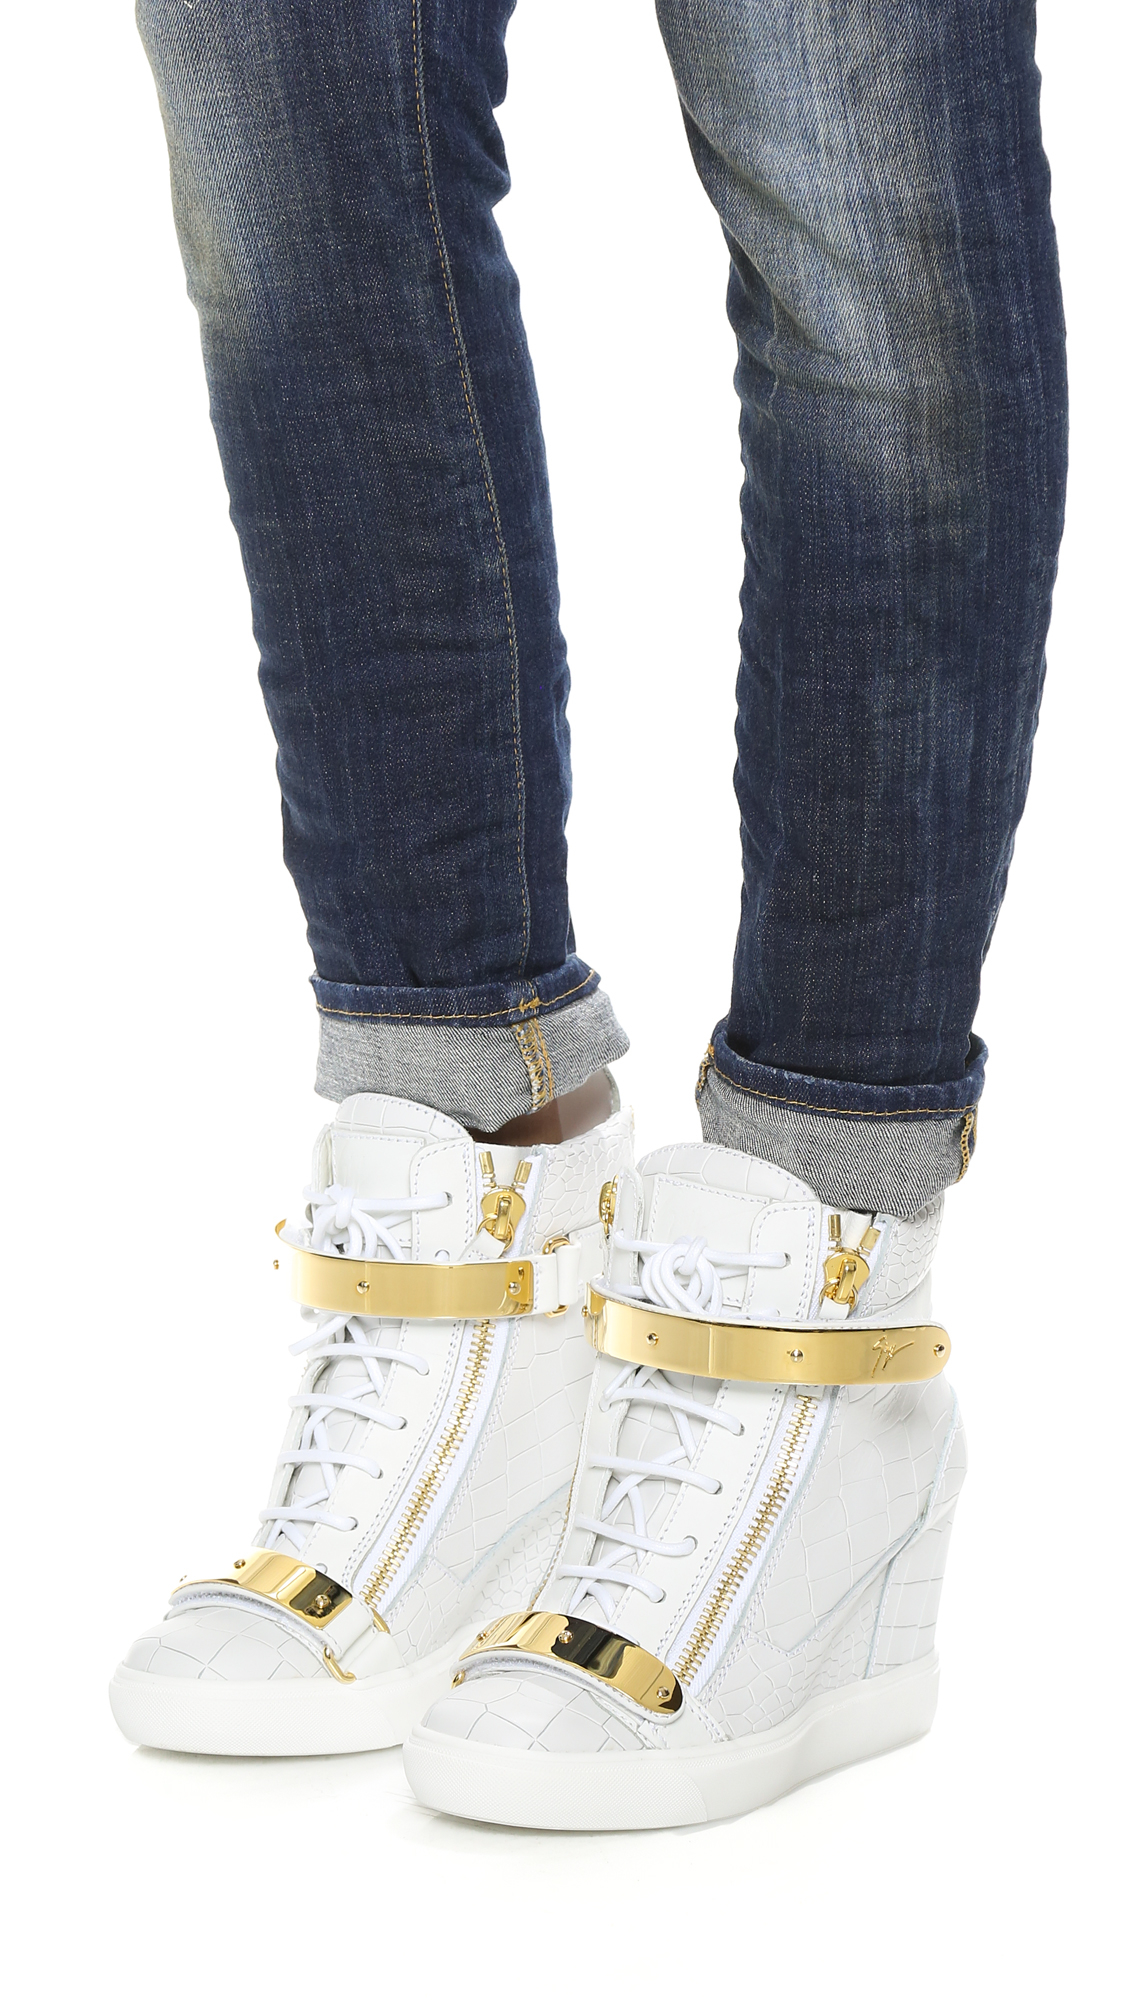 0db57cad33487 Giuseppe Zanotti Embossed Lorenz Wedge Sneakers in Gray - Lyst